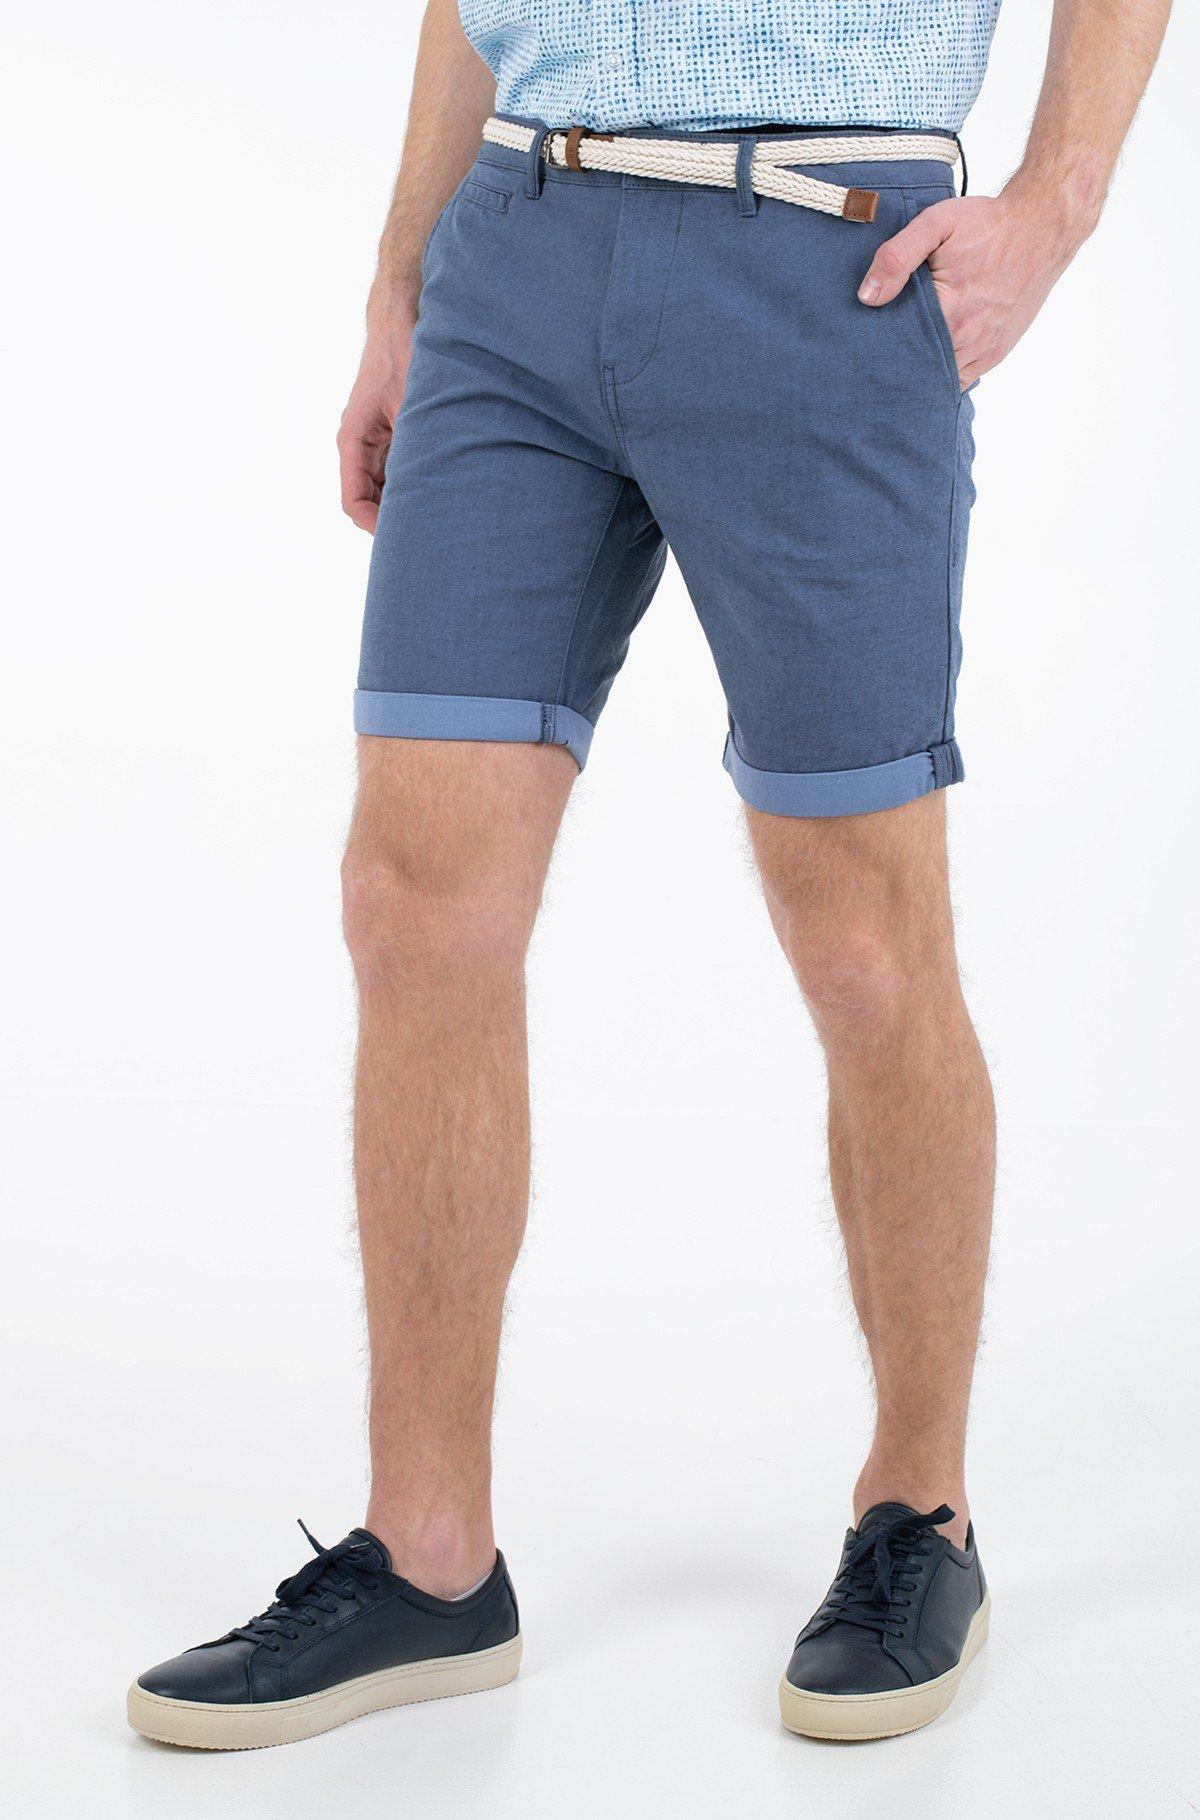 Shorts 1024576-full-1